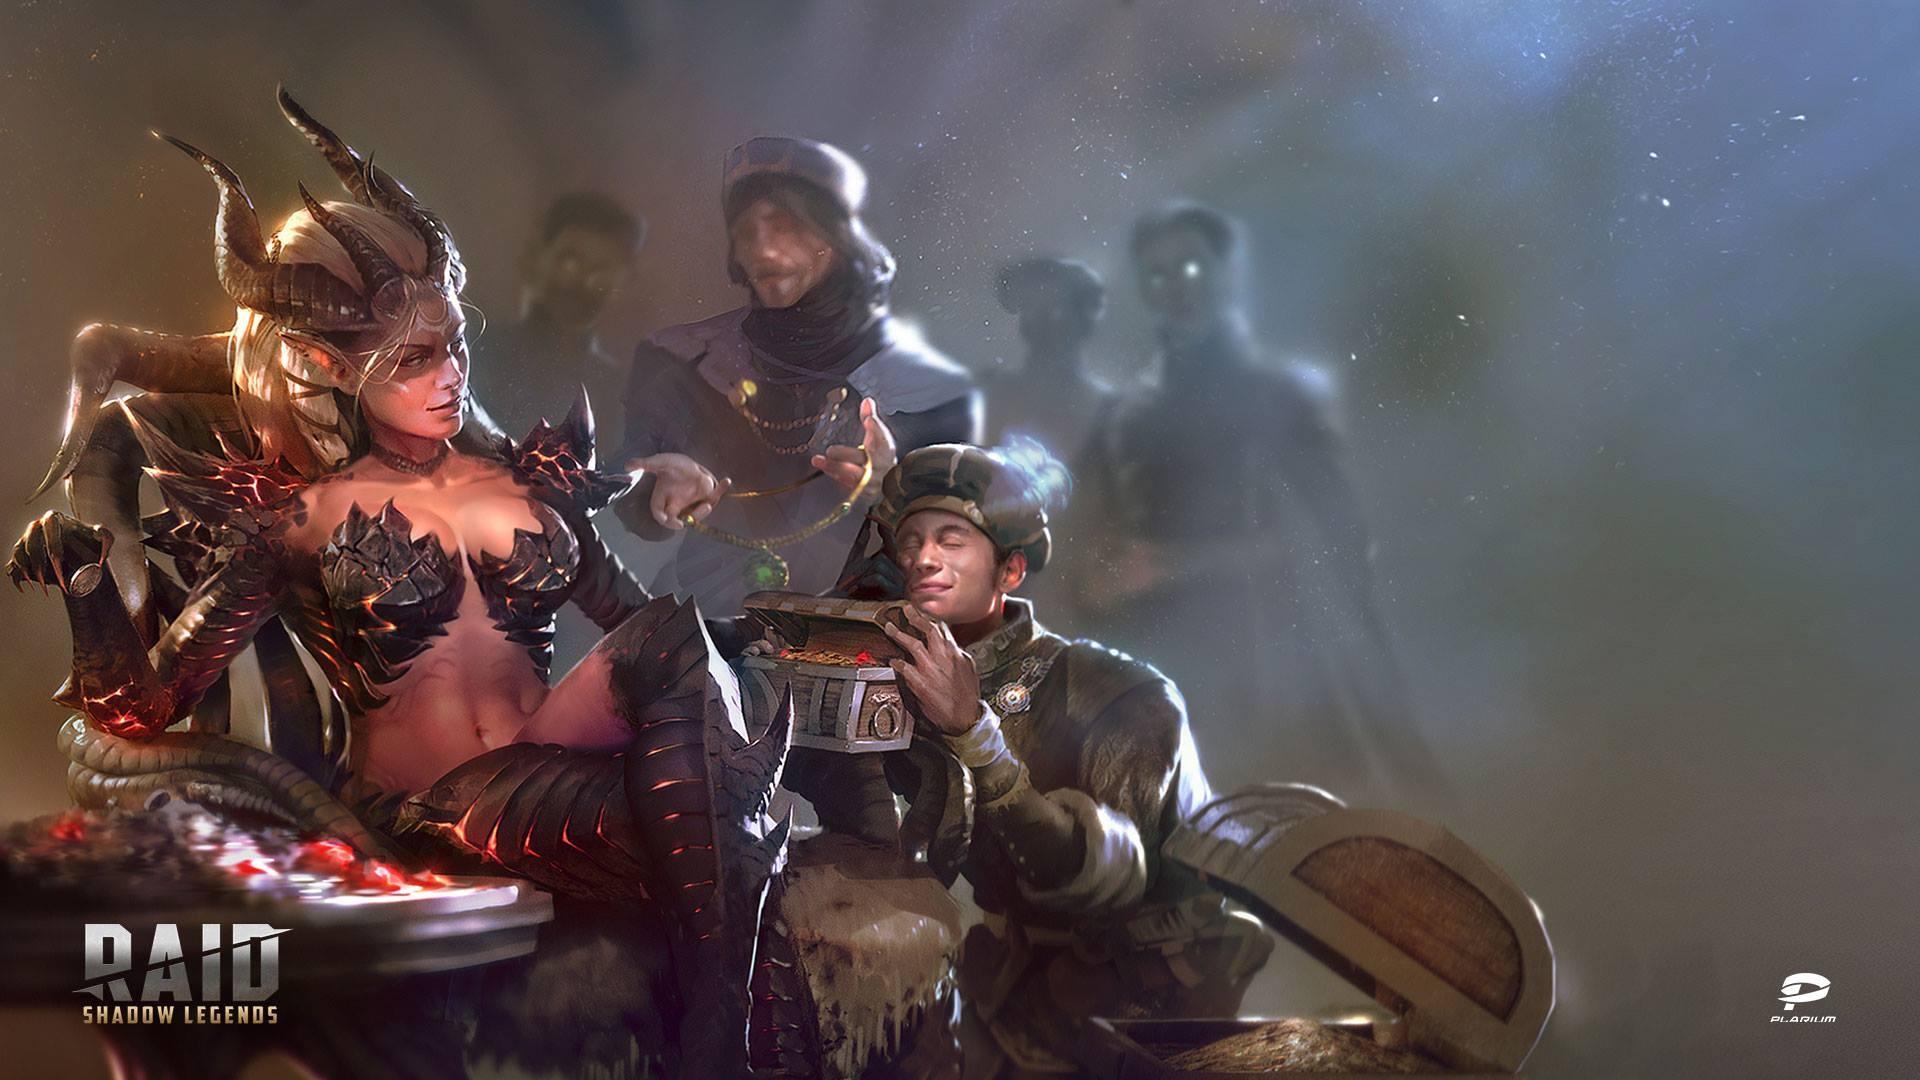 Raid Shadow Legends background wallpaper